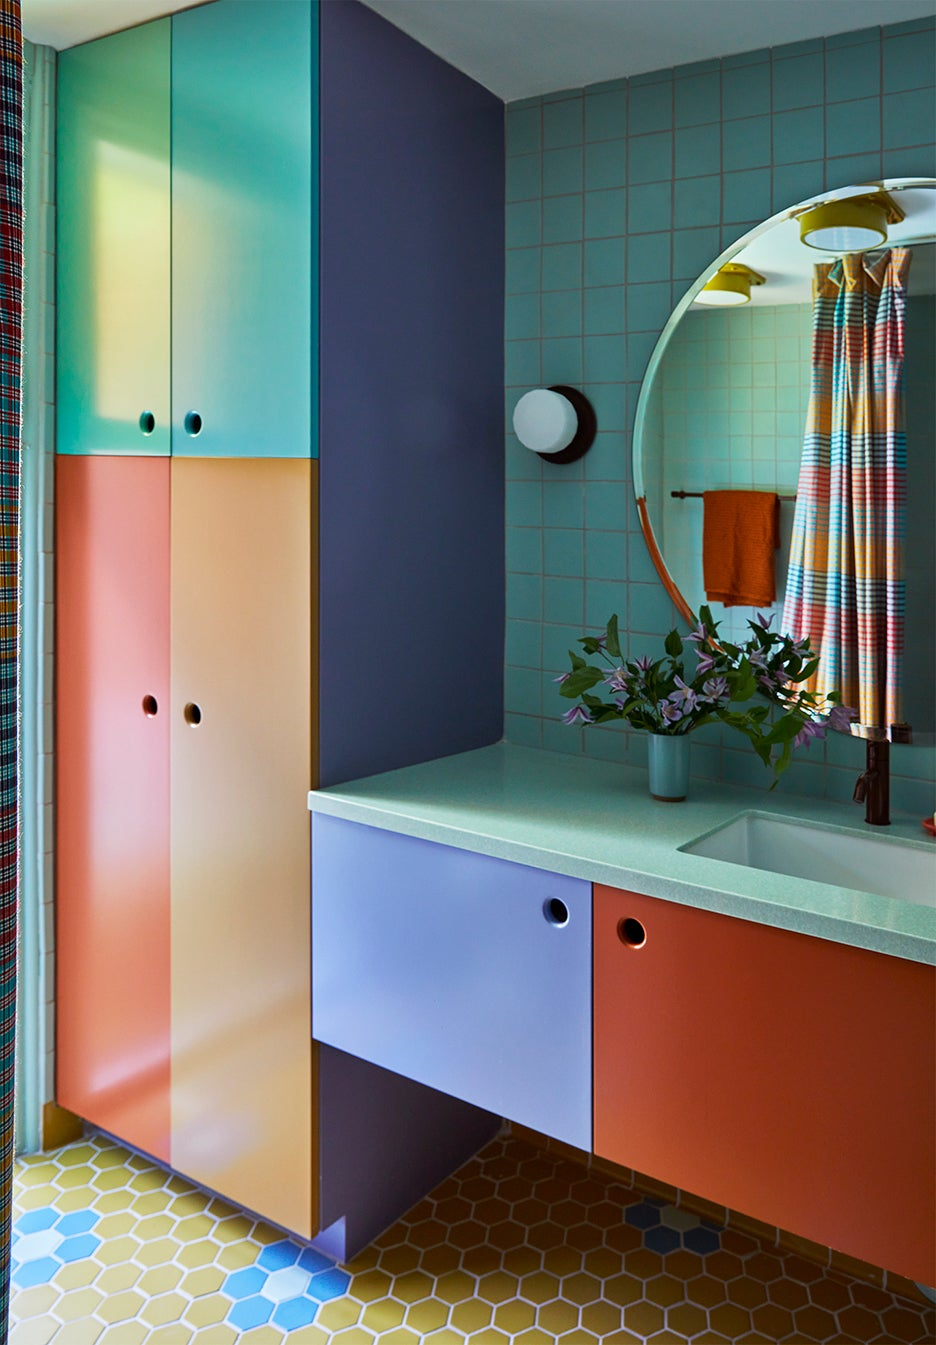 multicolored bathroom with green tile backsplash